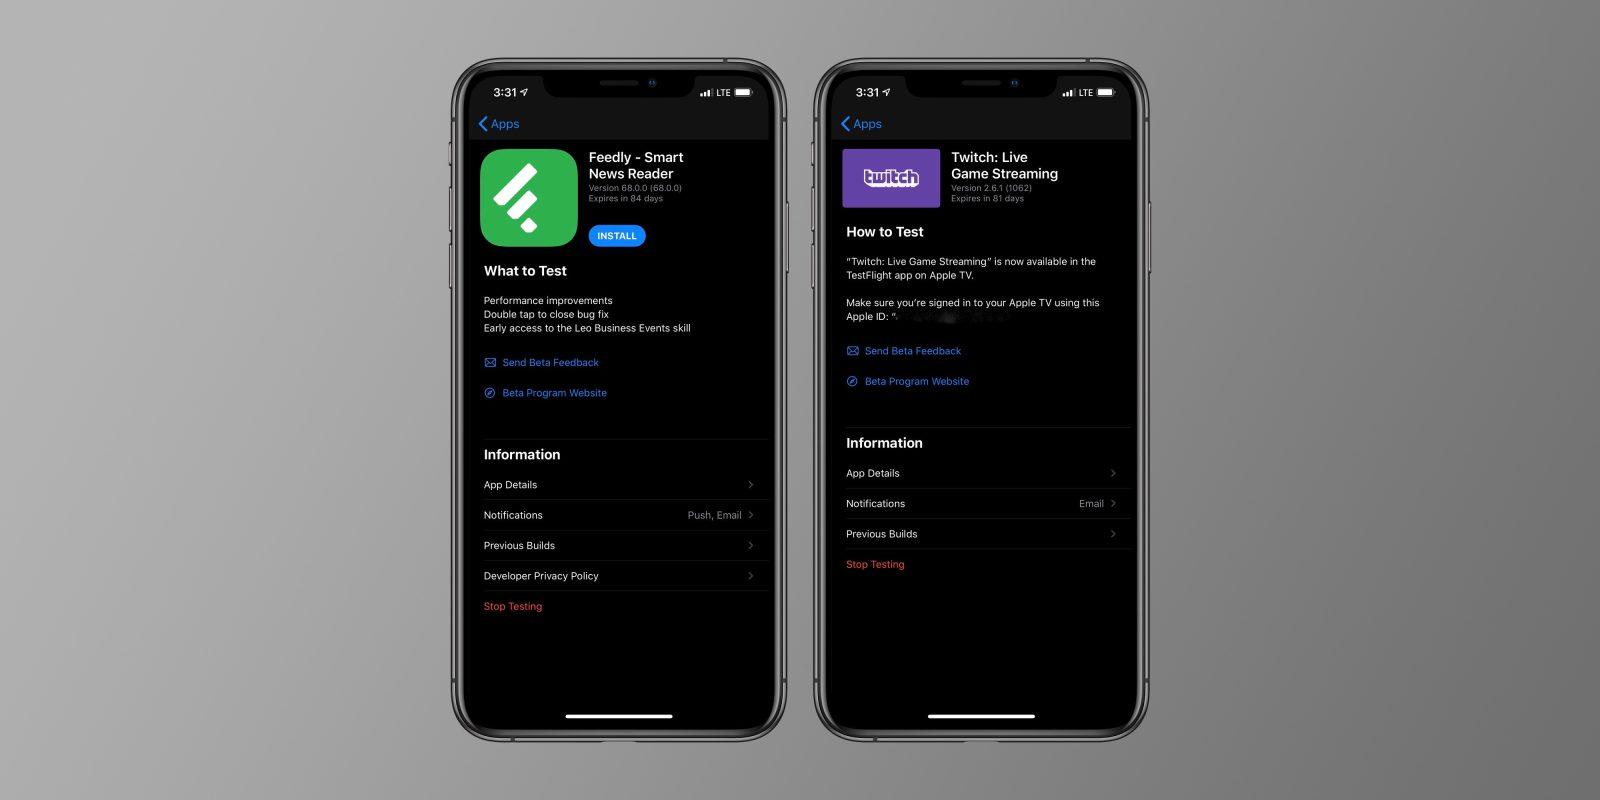 Apple's TestFlight beta testing app adds support for Dark Mode in iOS 13